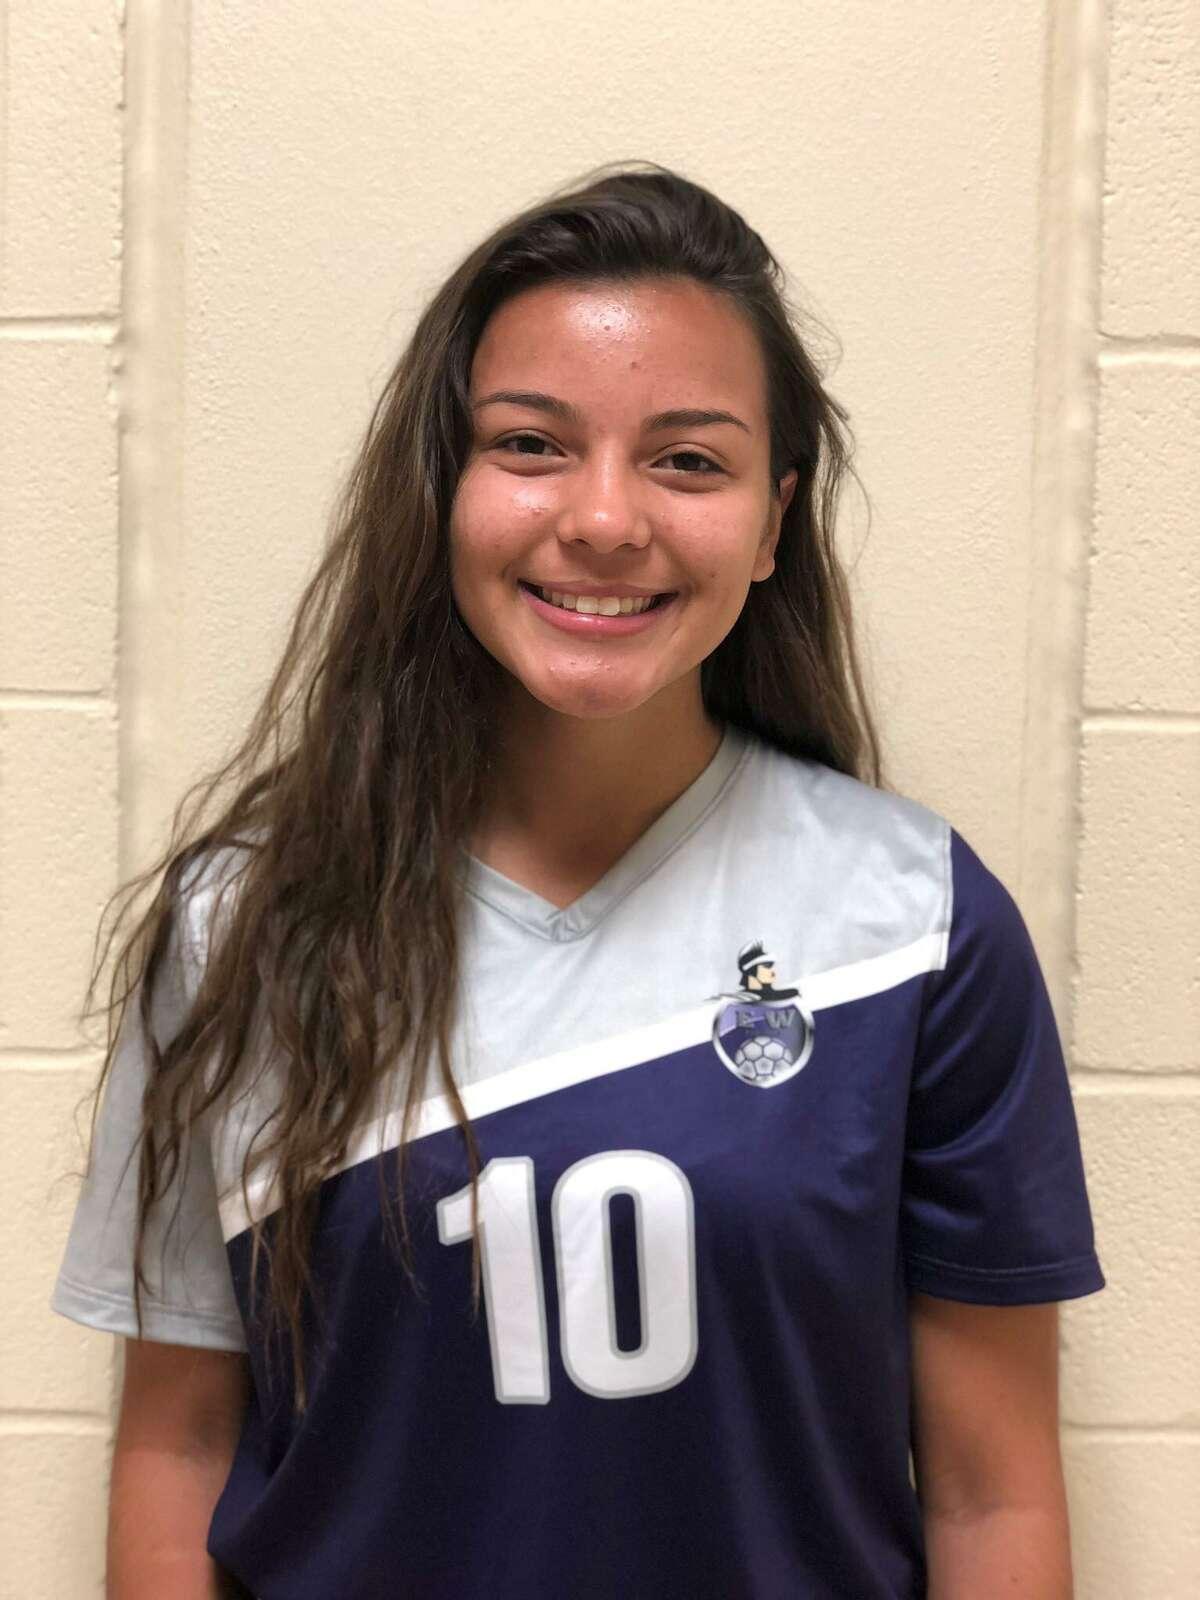 Warren soccer player Alyssa Simien